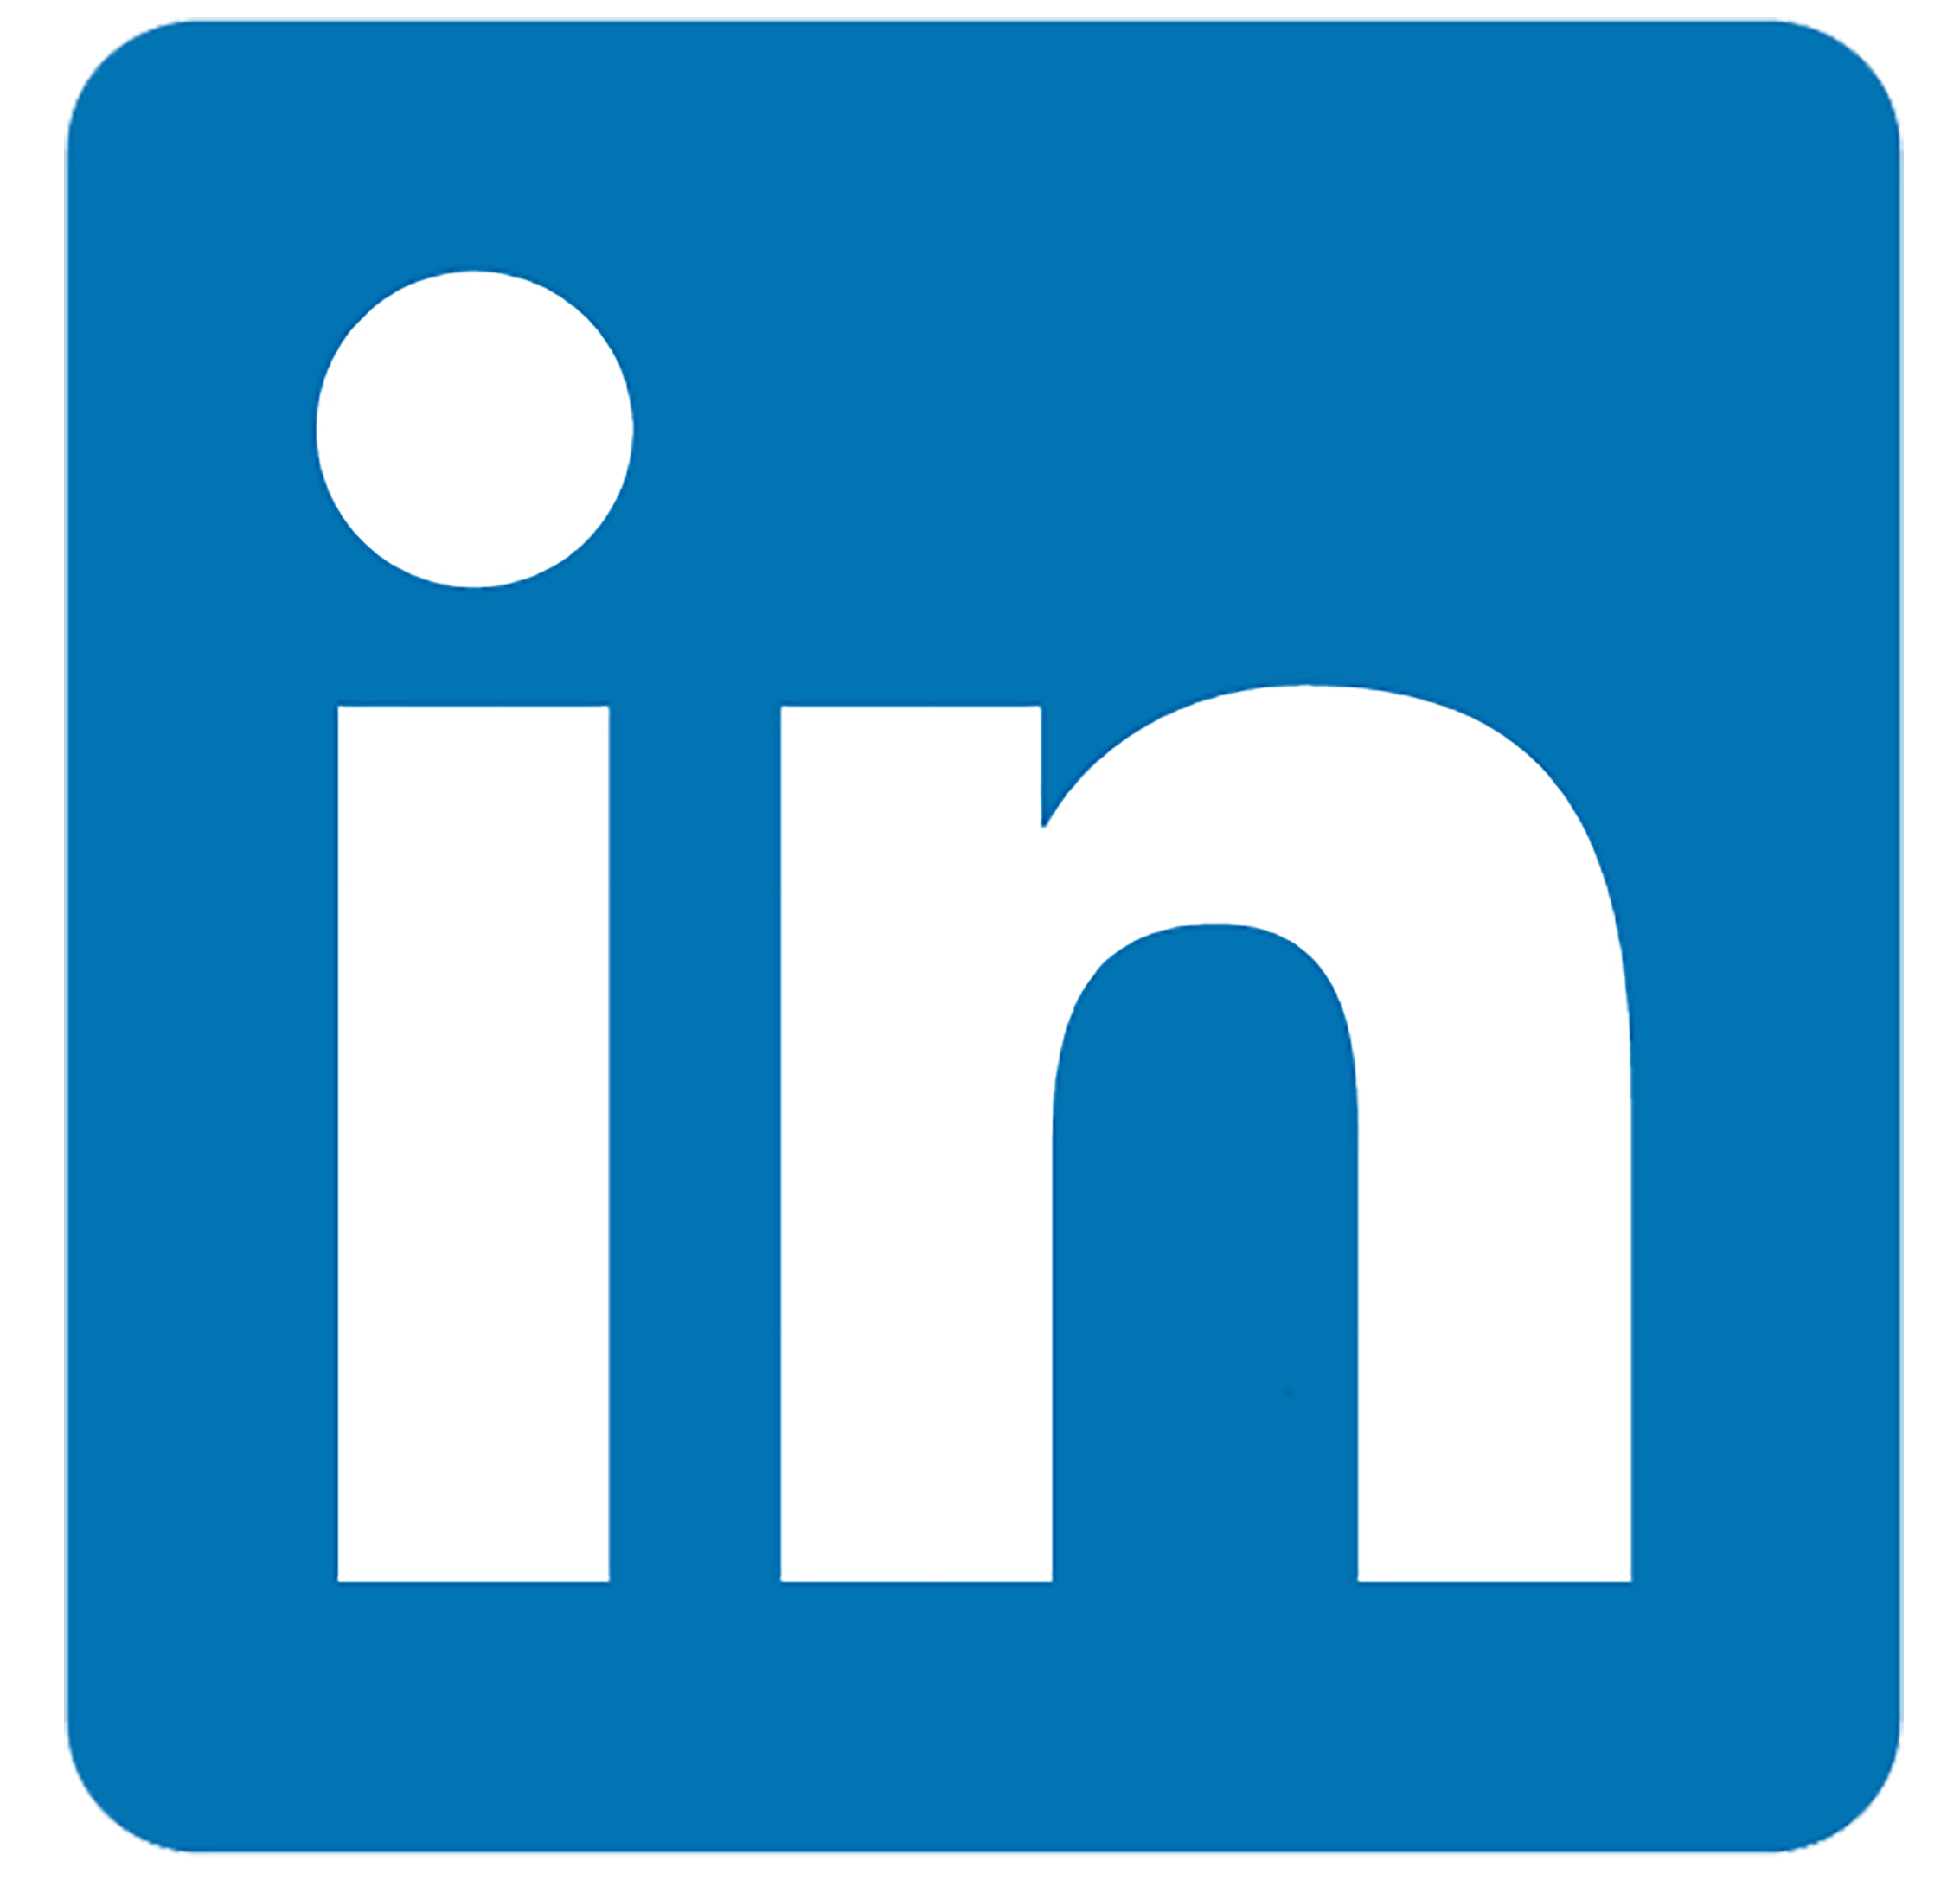 Reap Linkedin - image